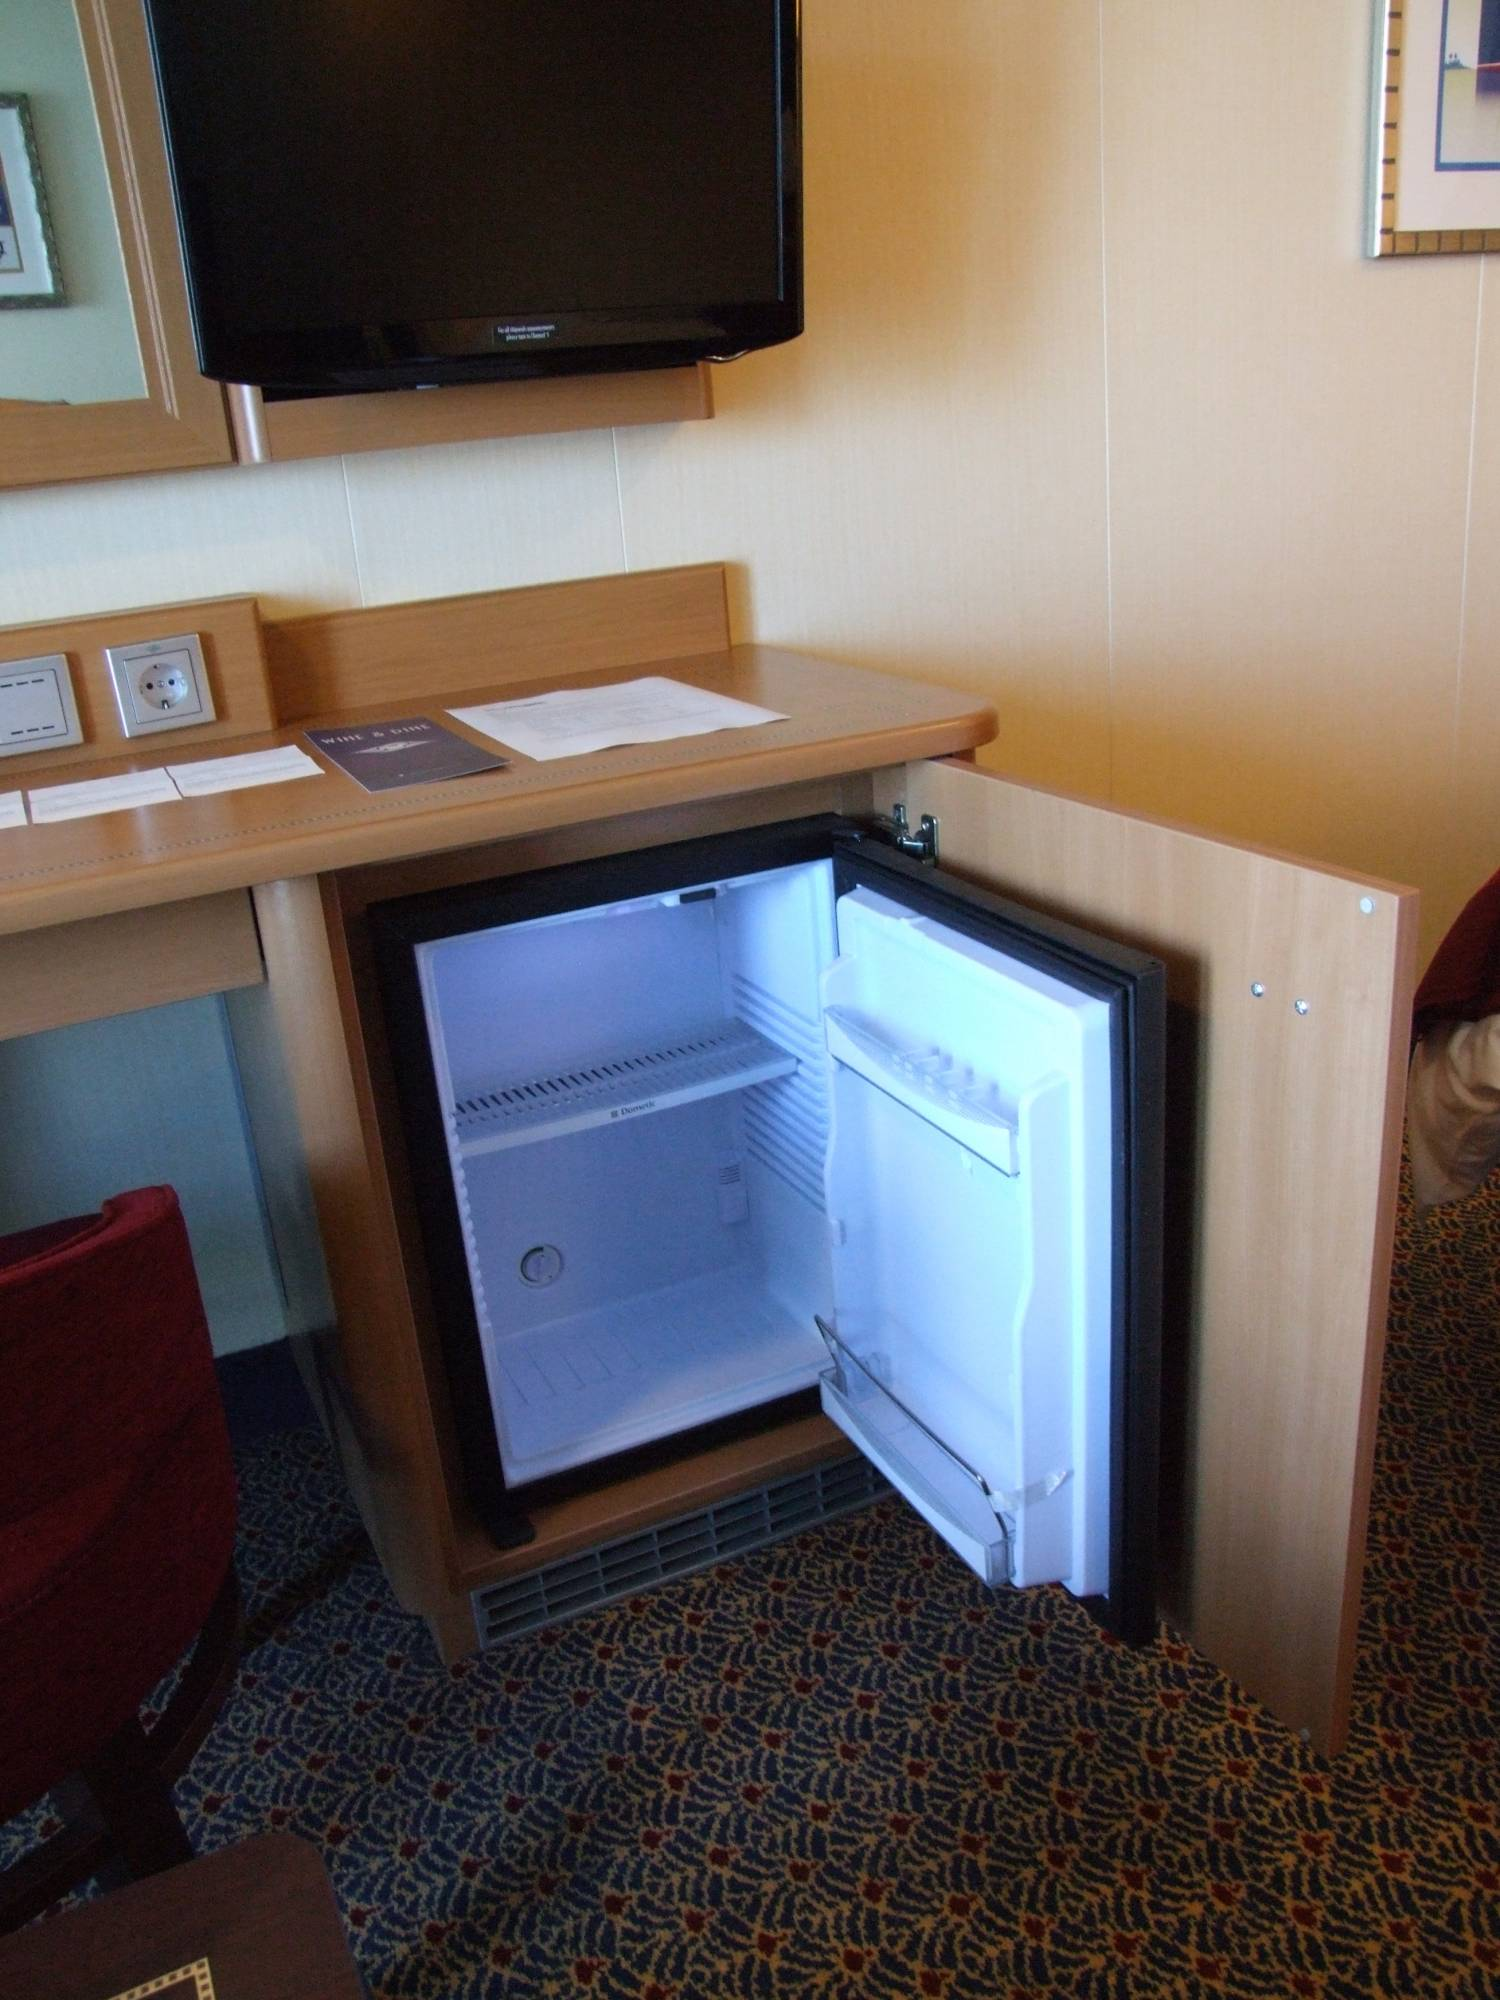 Disney Dream - Cooler/Refrigerator in Stateroom